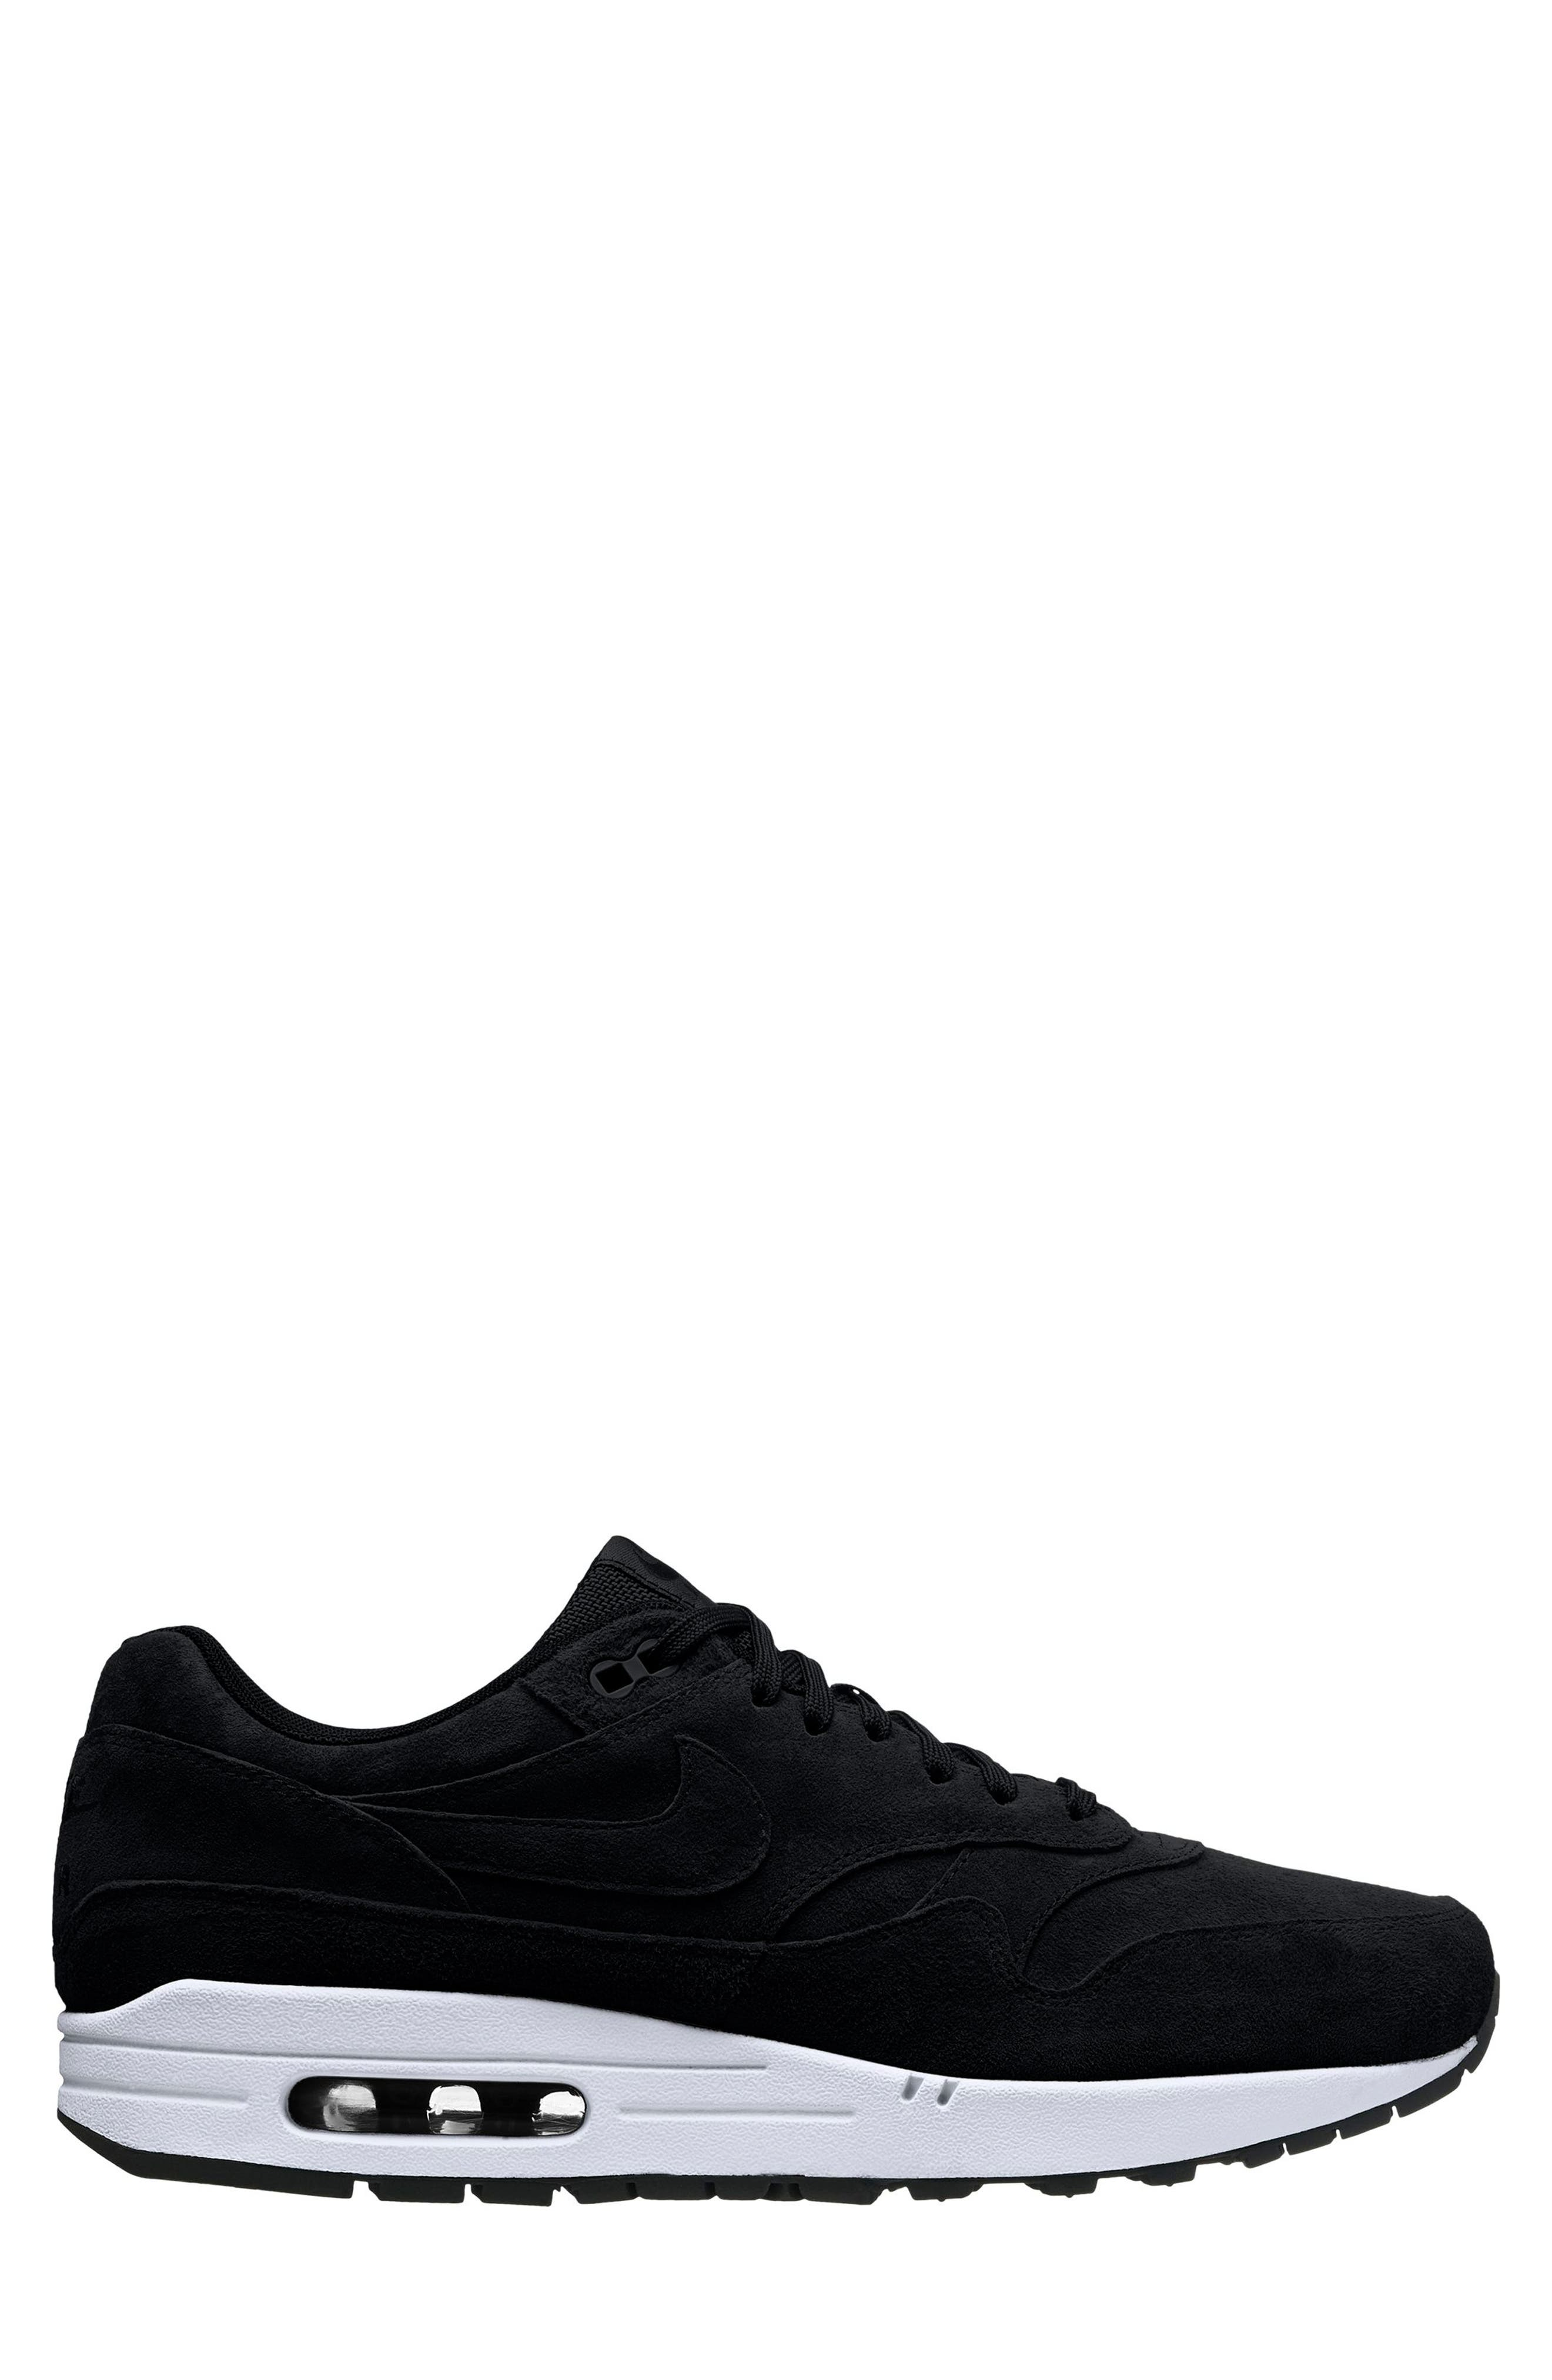 NIKE, Air Max 1 SE Sneaker, Main thumbnail 1, color, 005